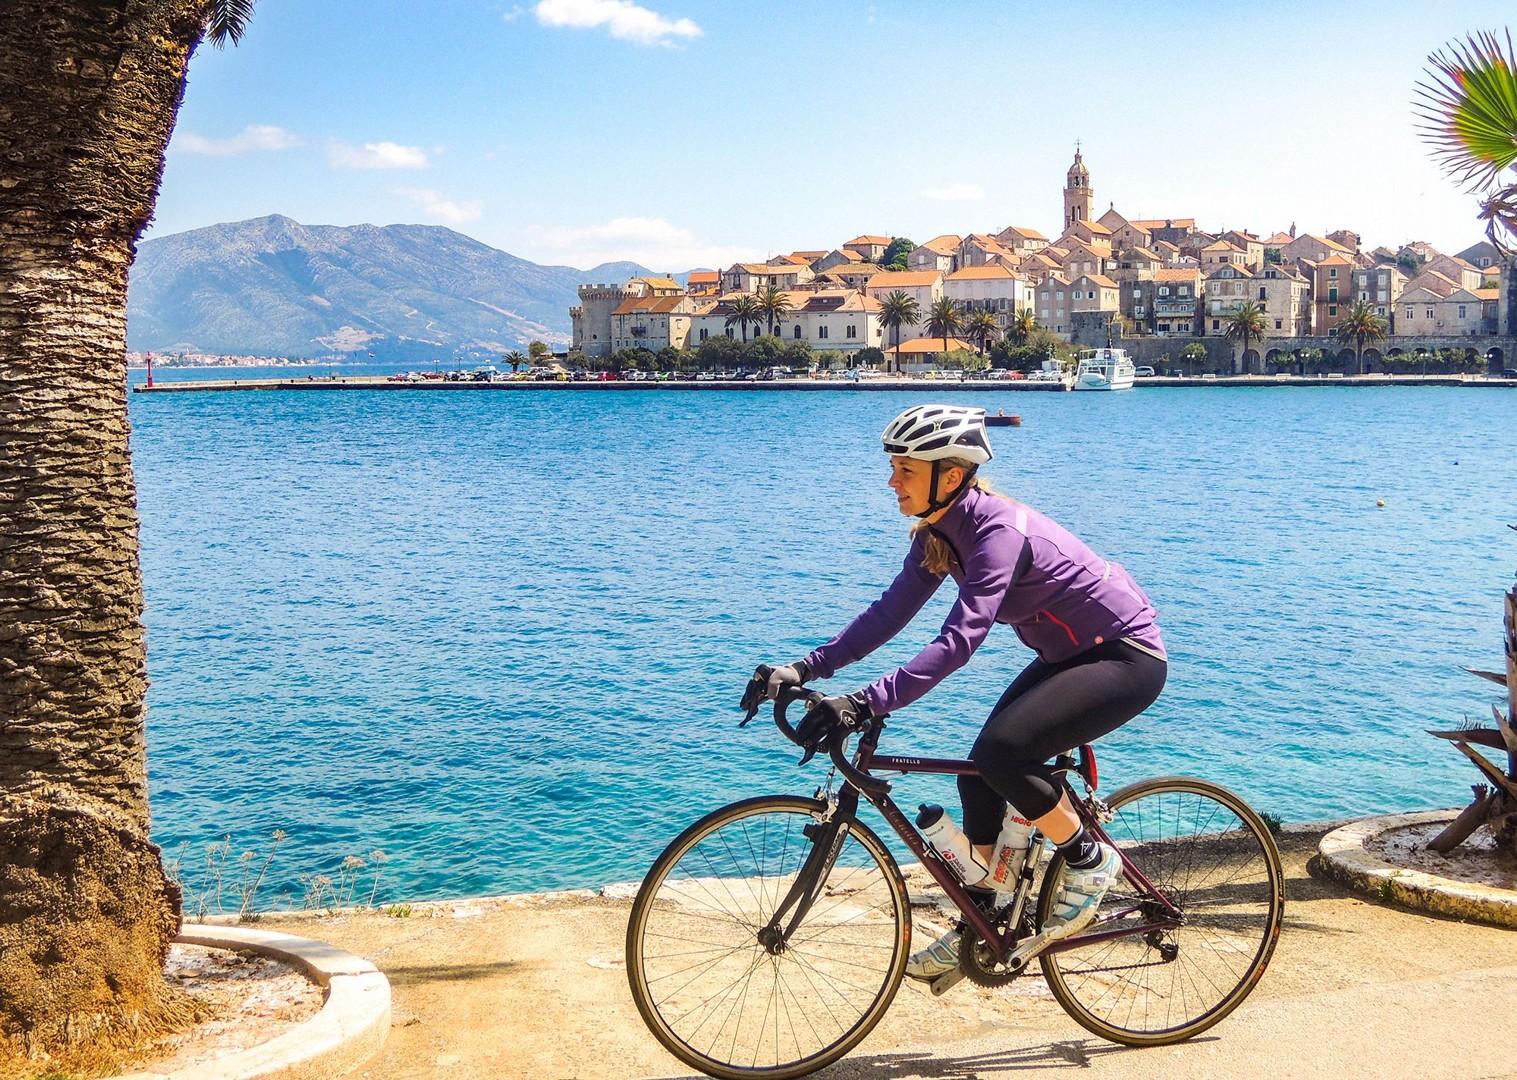 DSCN7123.jpg - Croatia - Islands of the Dalmatian Coast - Guided Road Cycling Holiday - Road Cycling